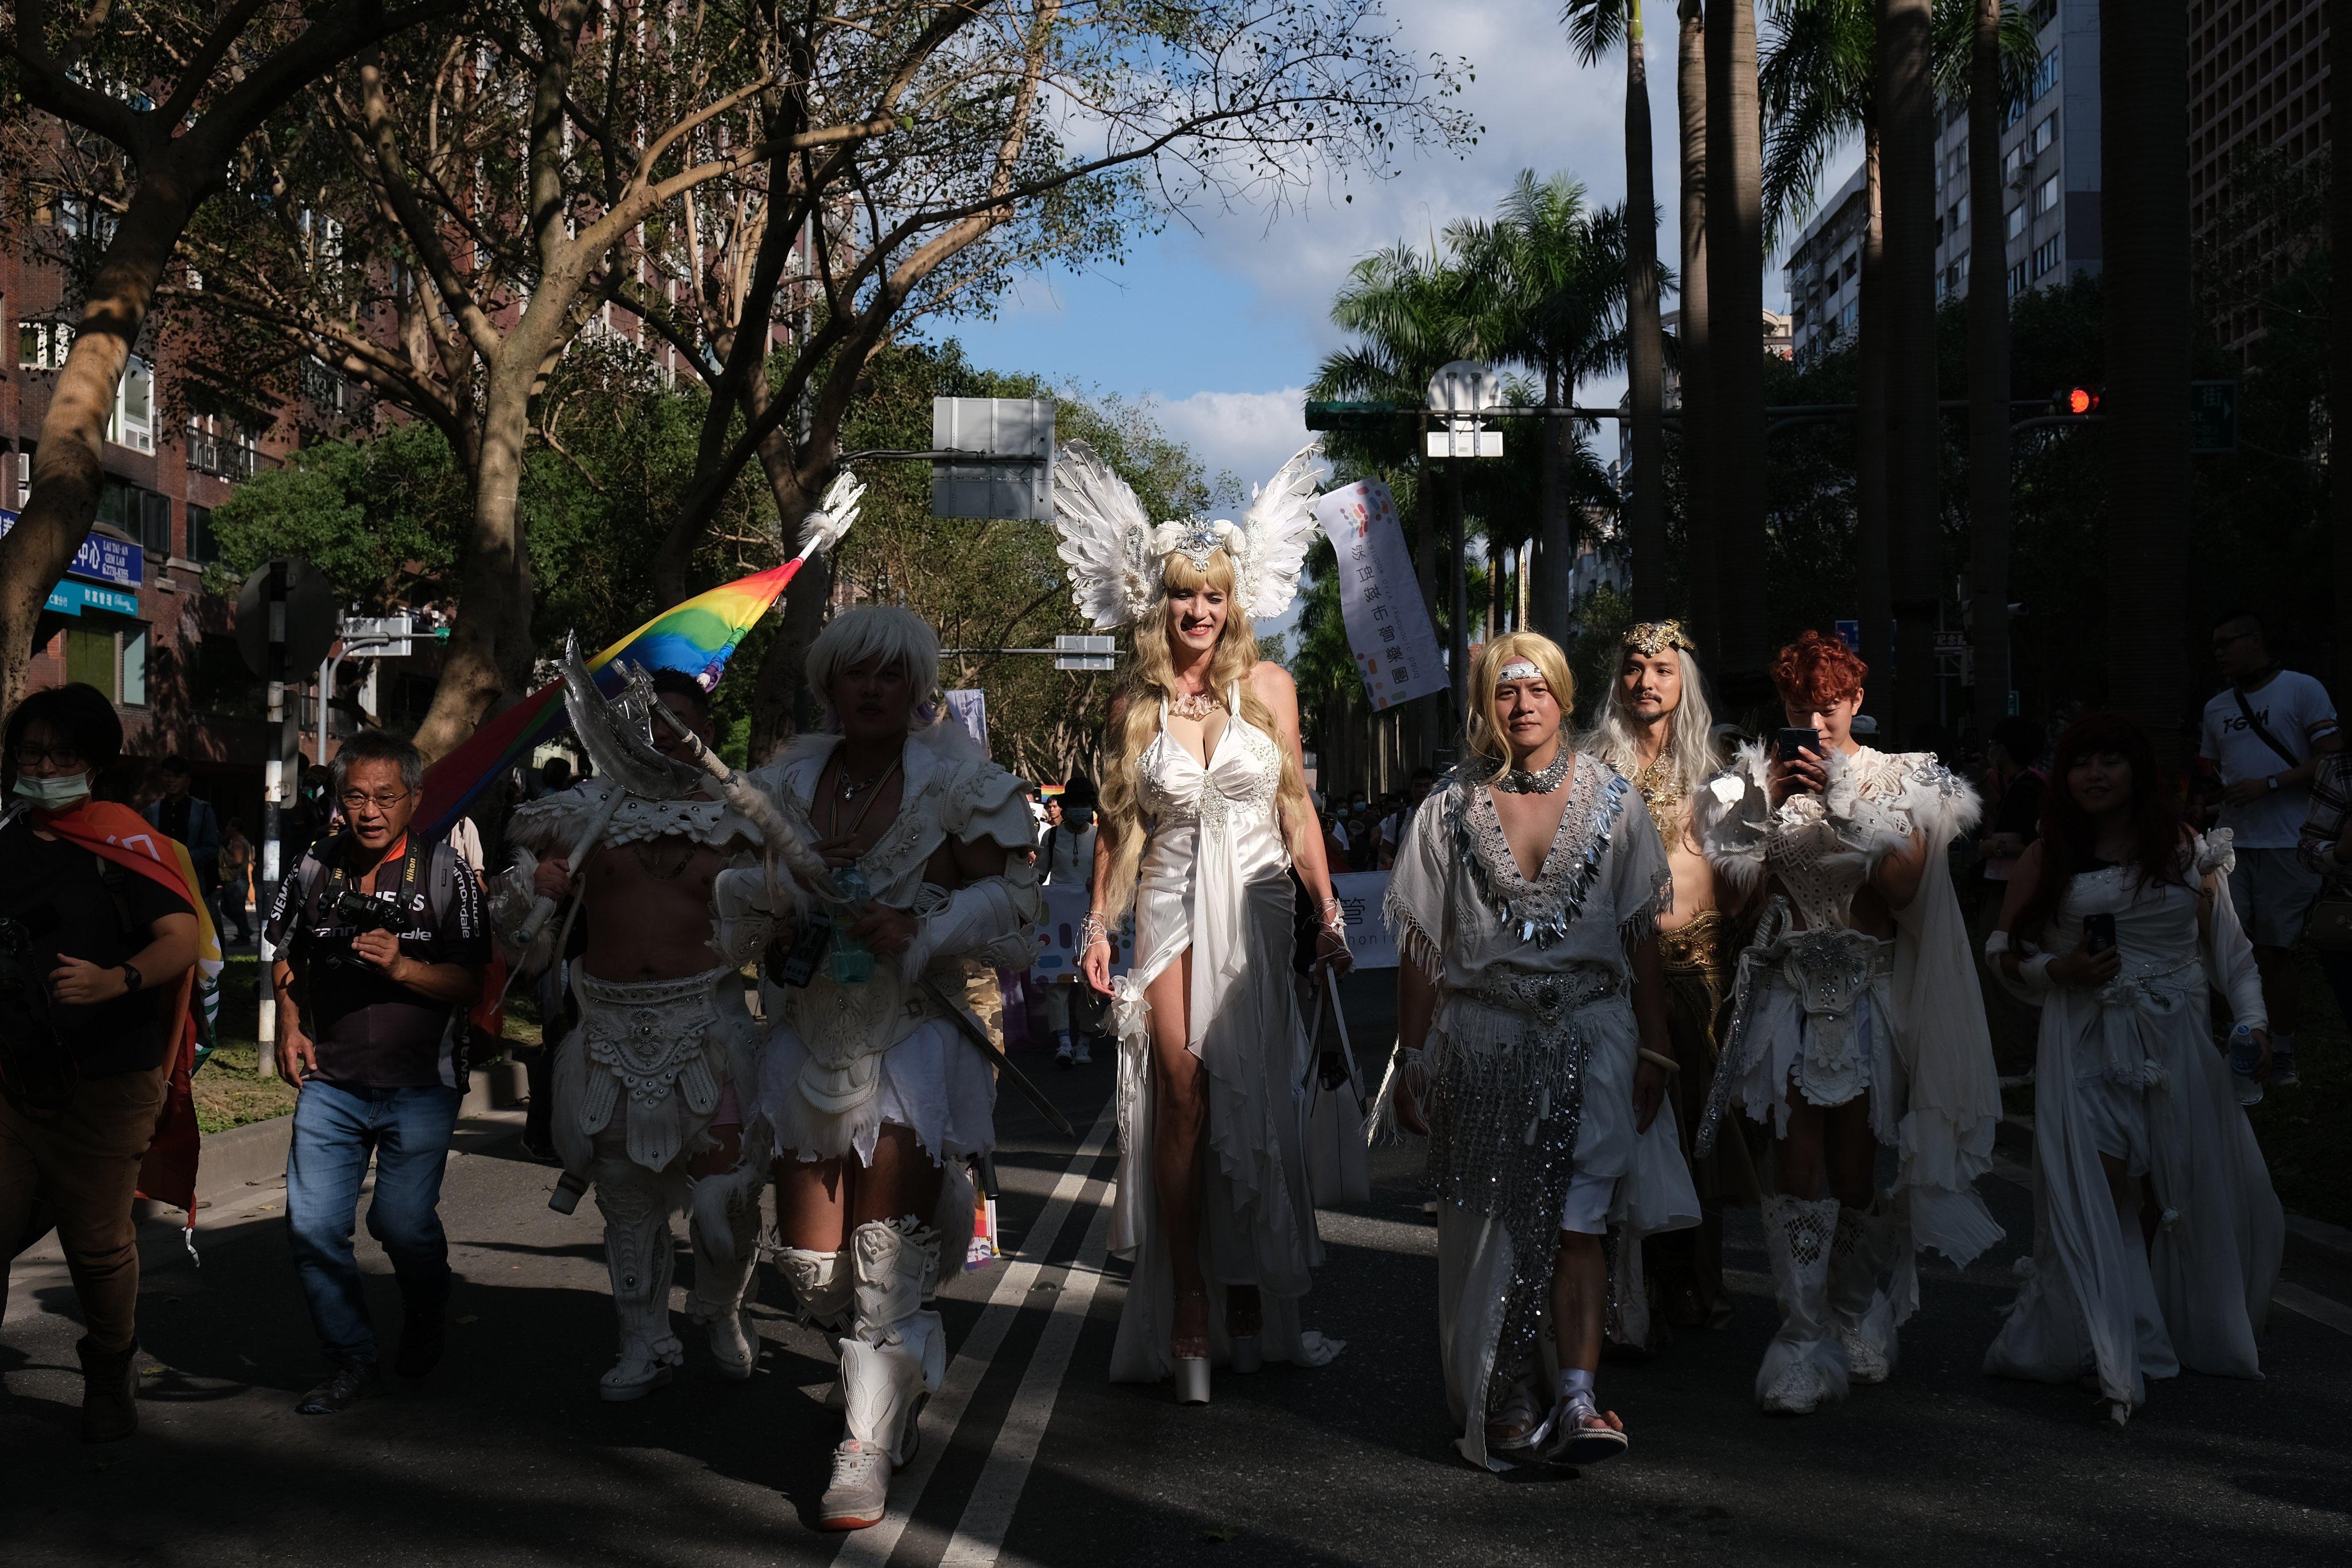 Parada LGBT de Taiwan 2020 (Foto: Reprodução / Twitter)